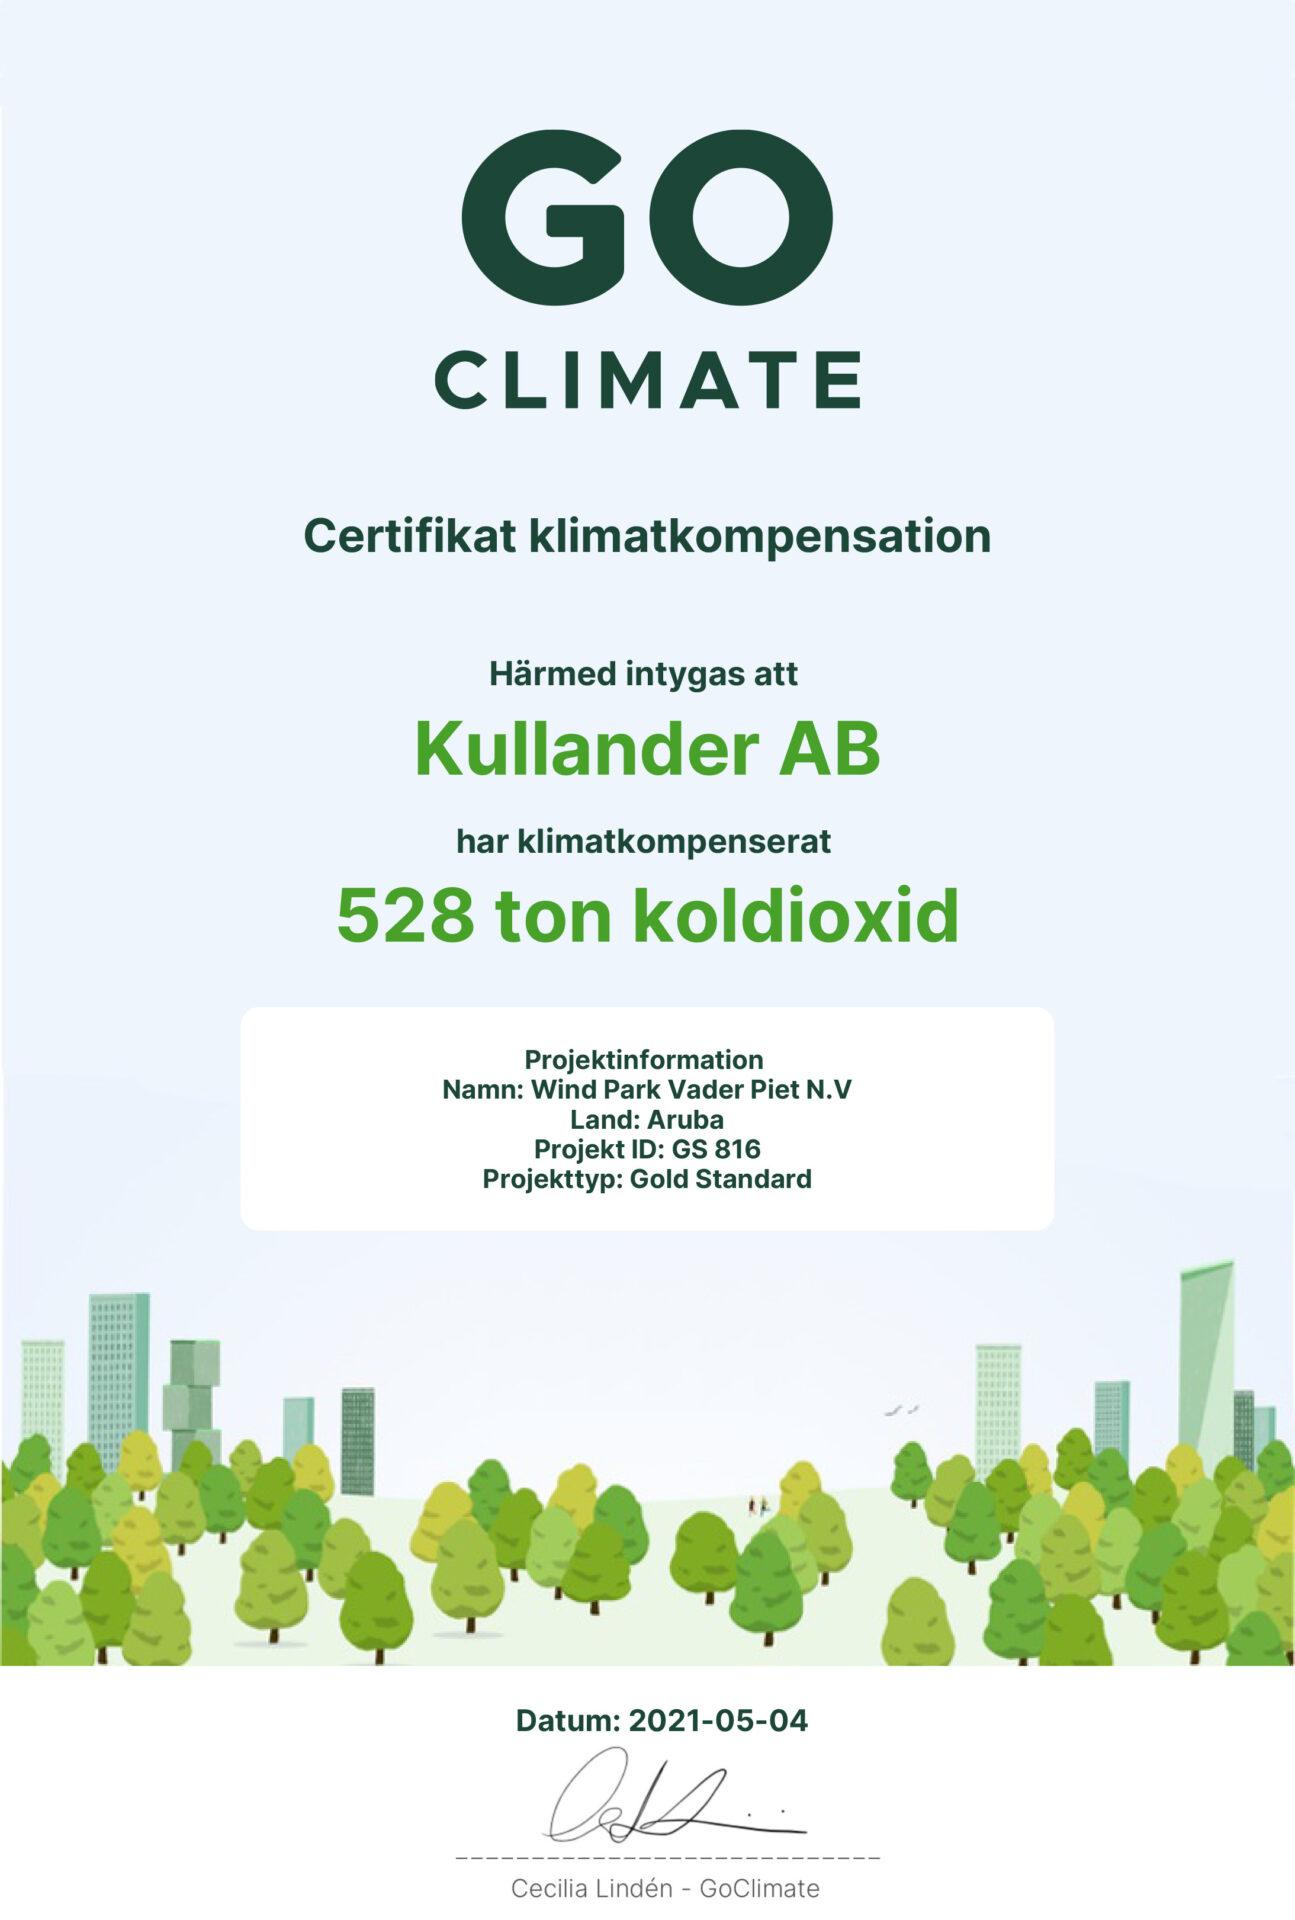 Go climate certifkat 2021